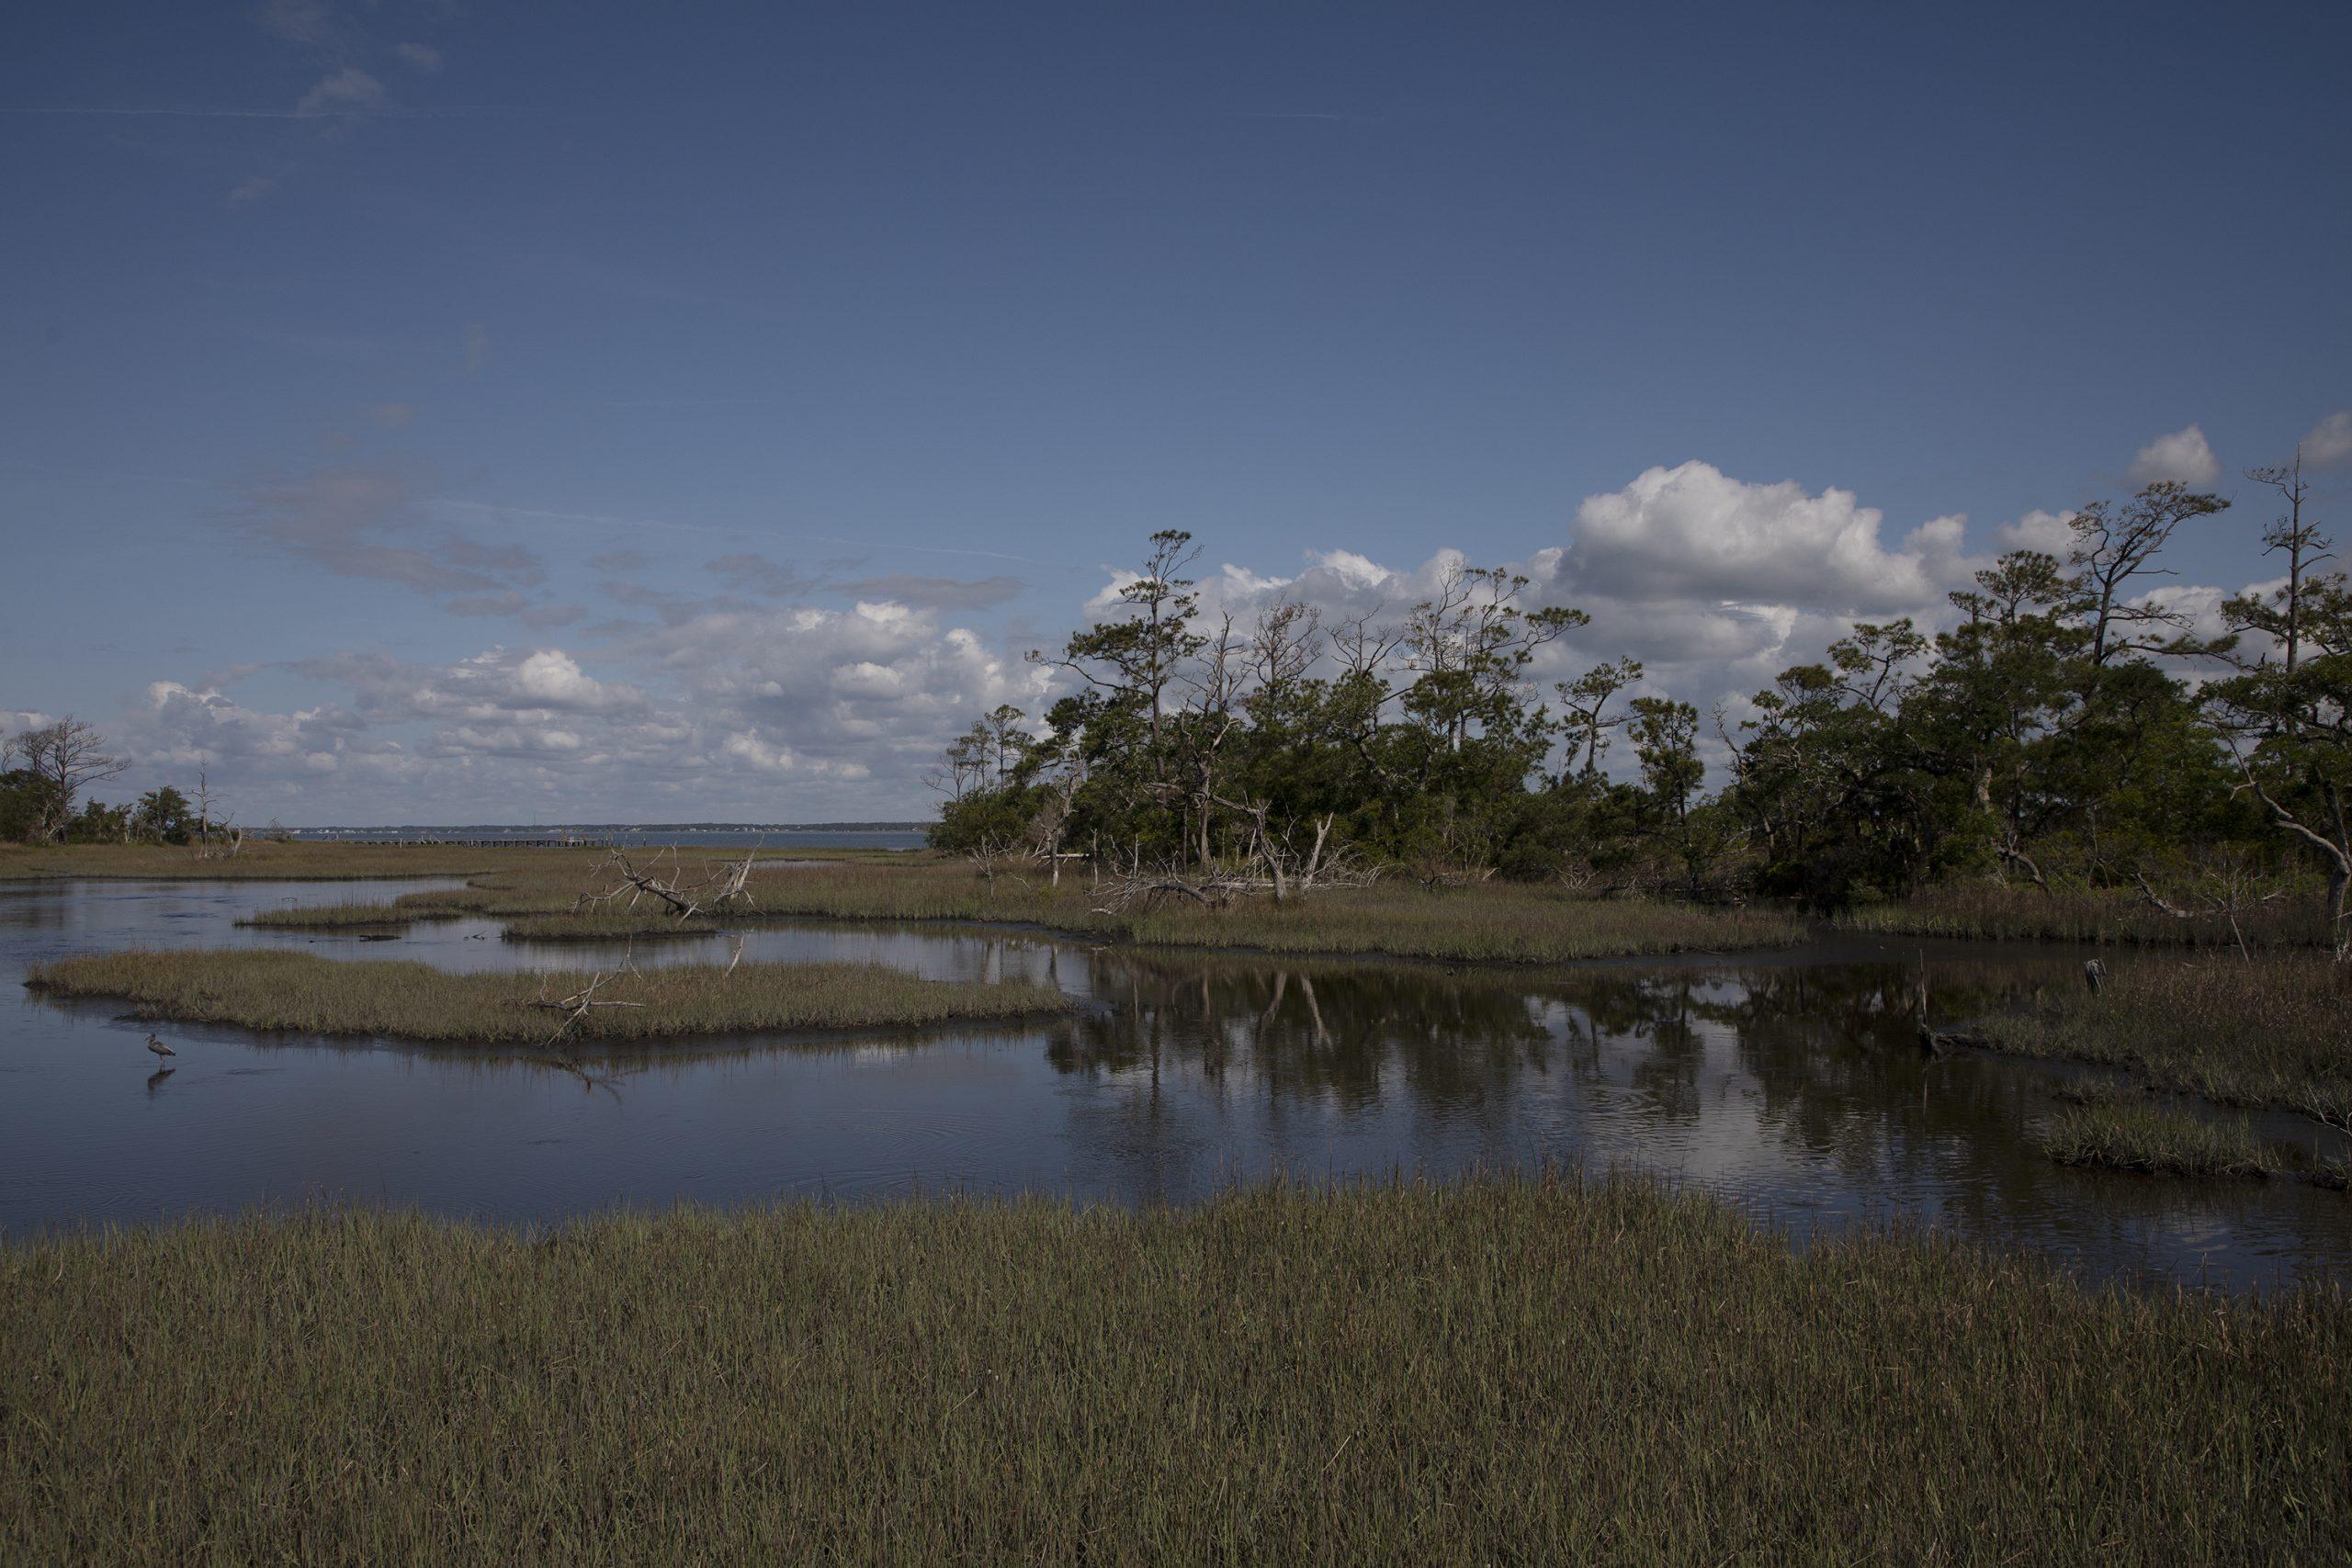 Photo of a salt marsh off the coast of North Carolina.